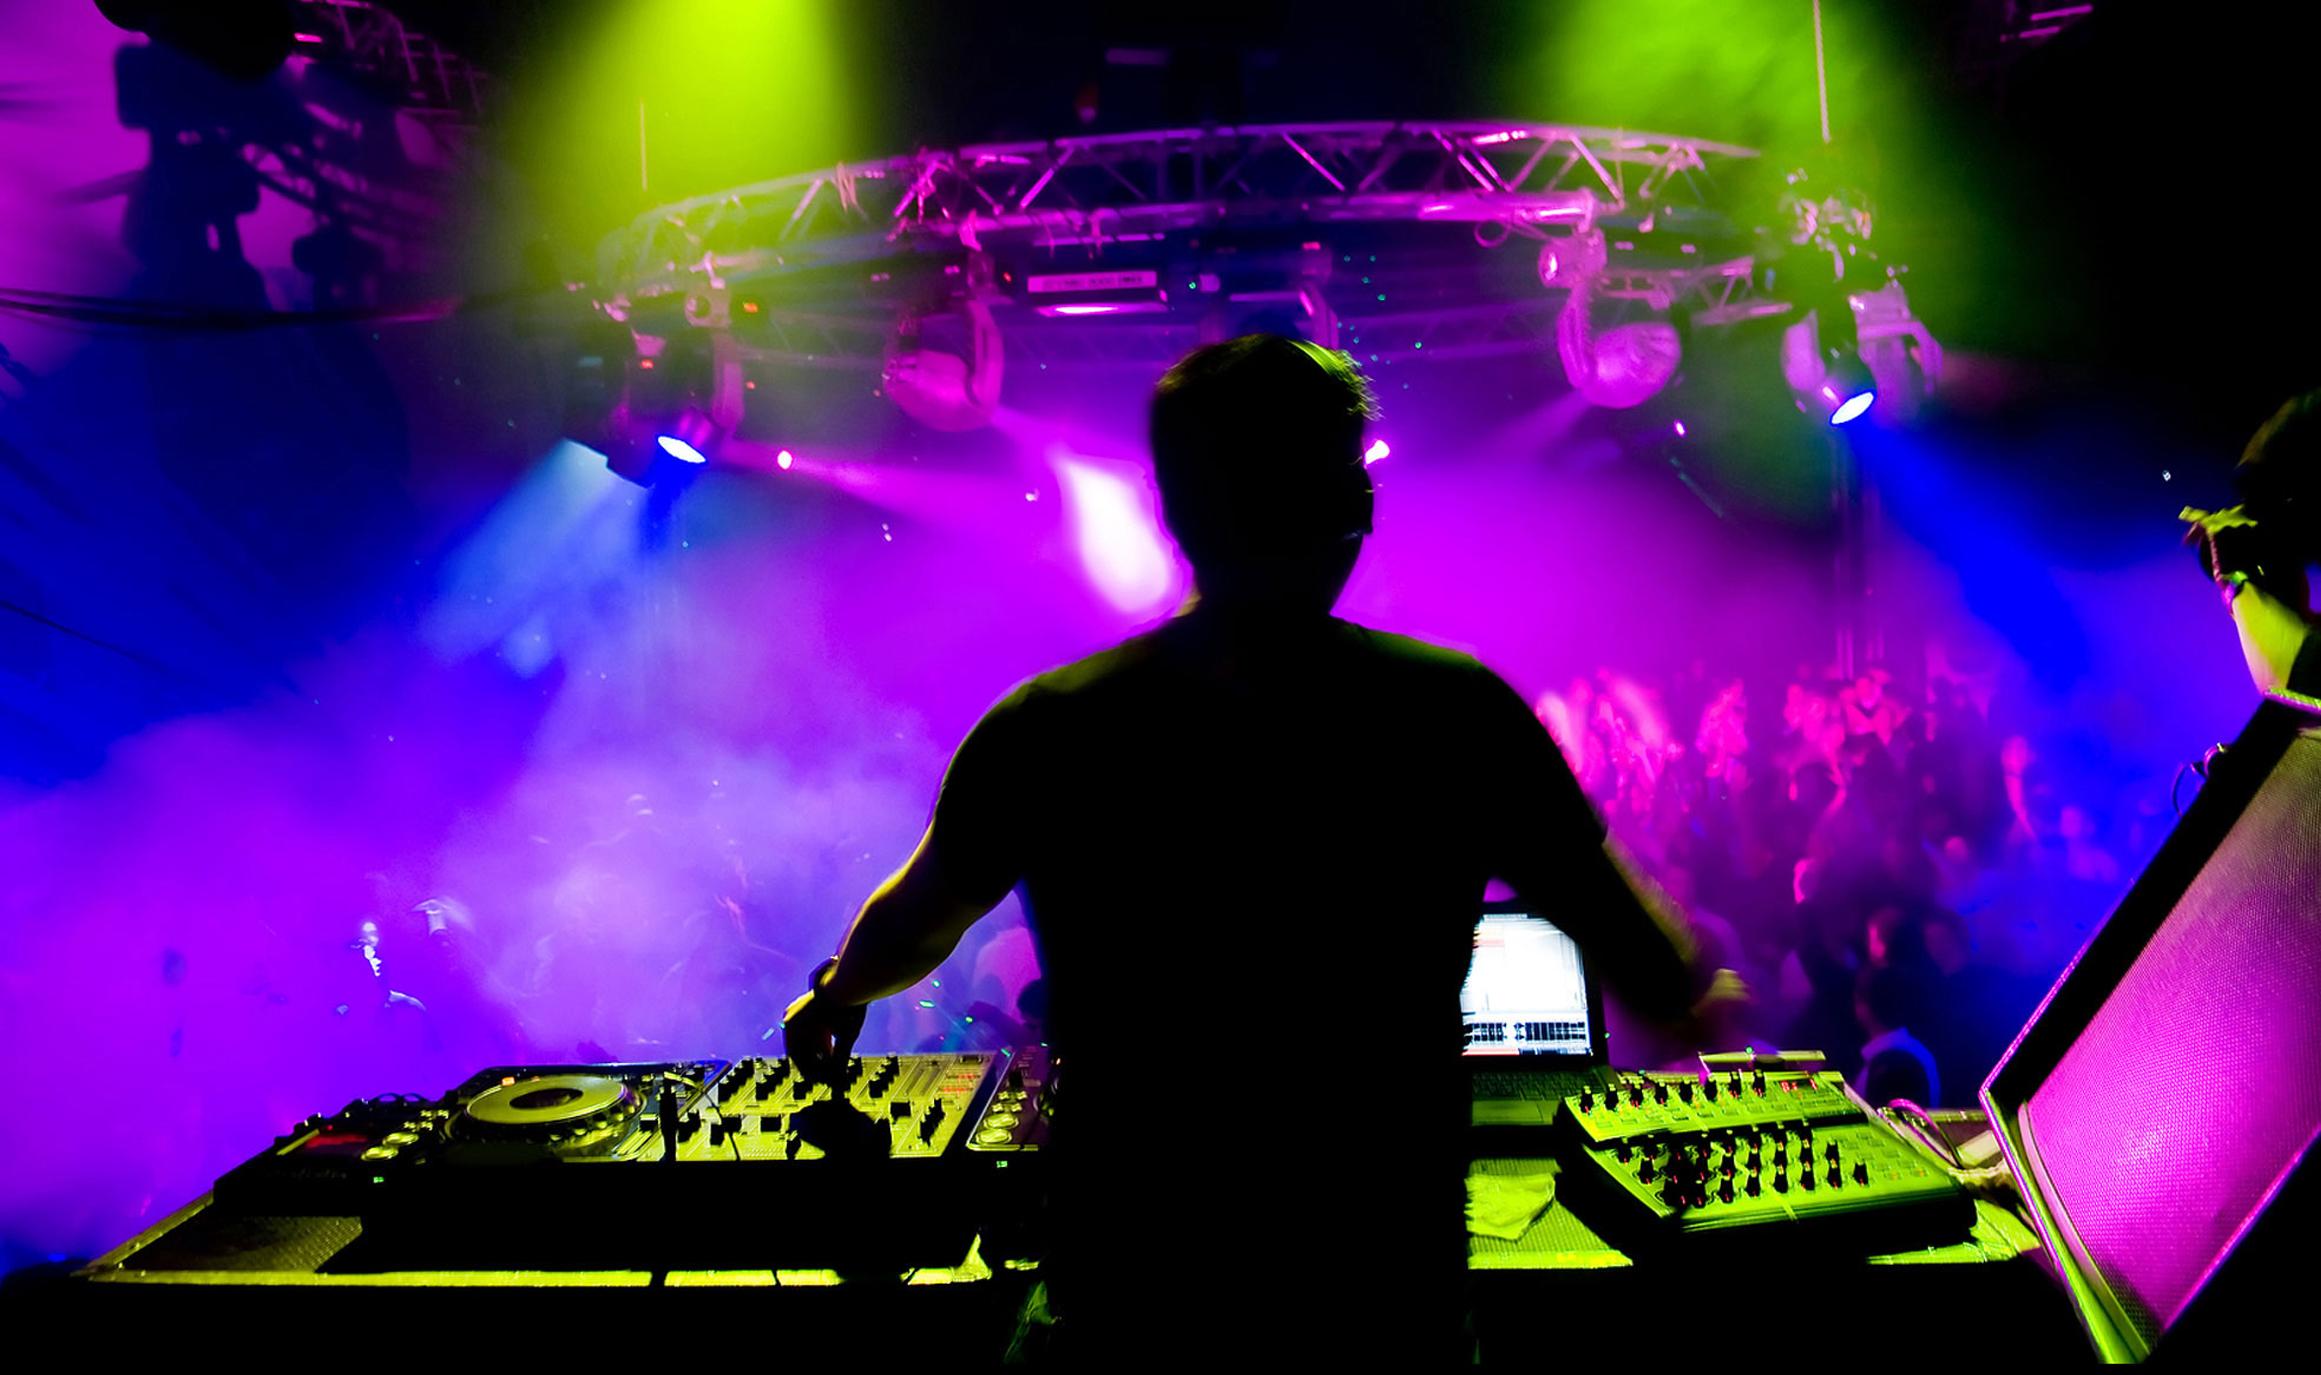 DJ and Pub Lighting